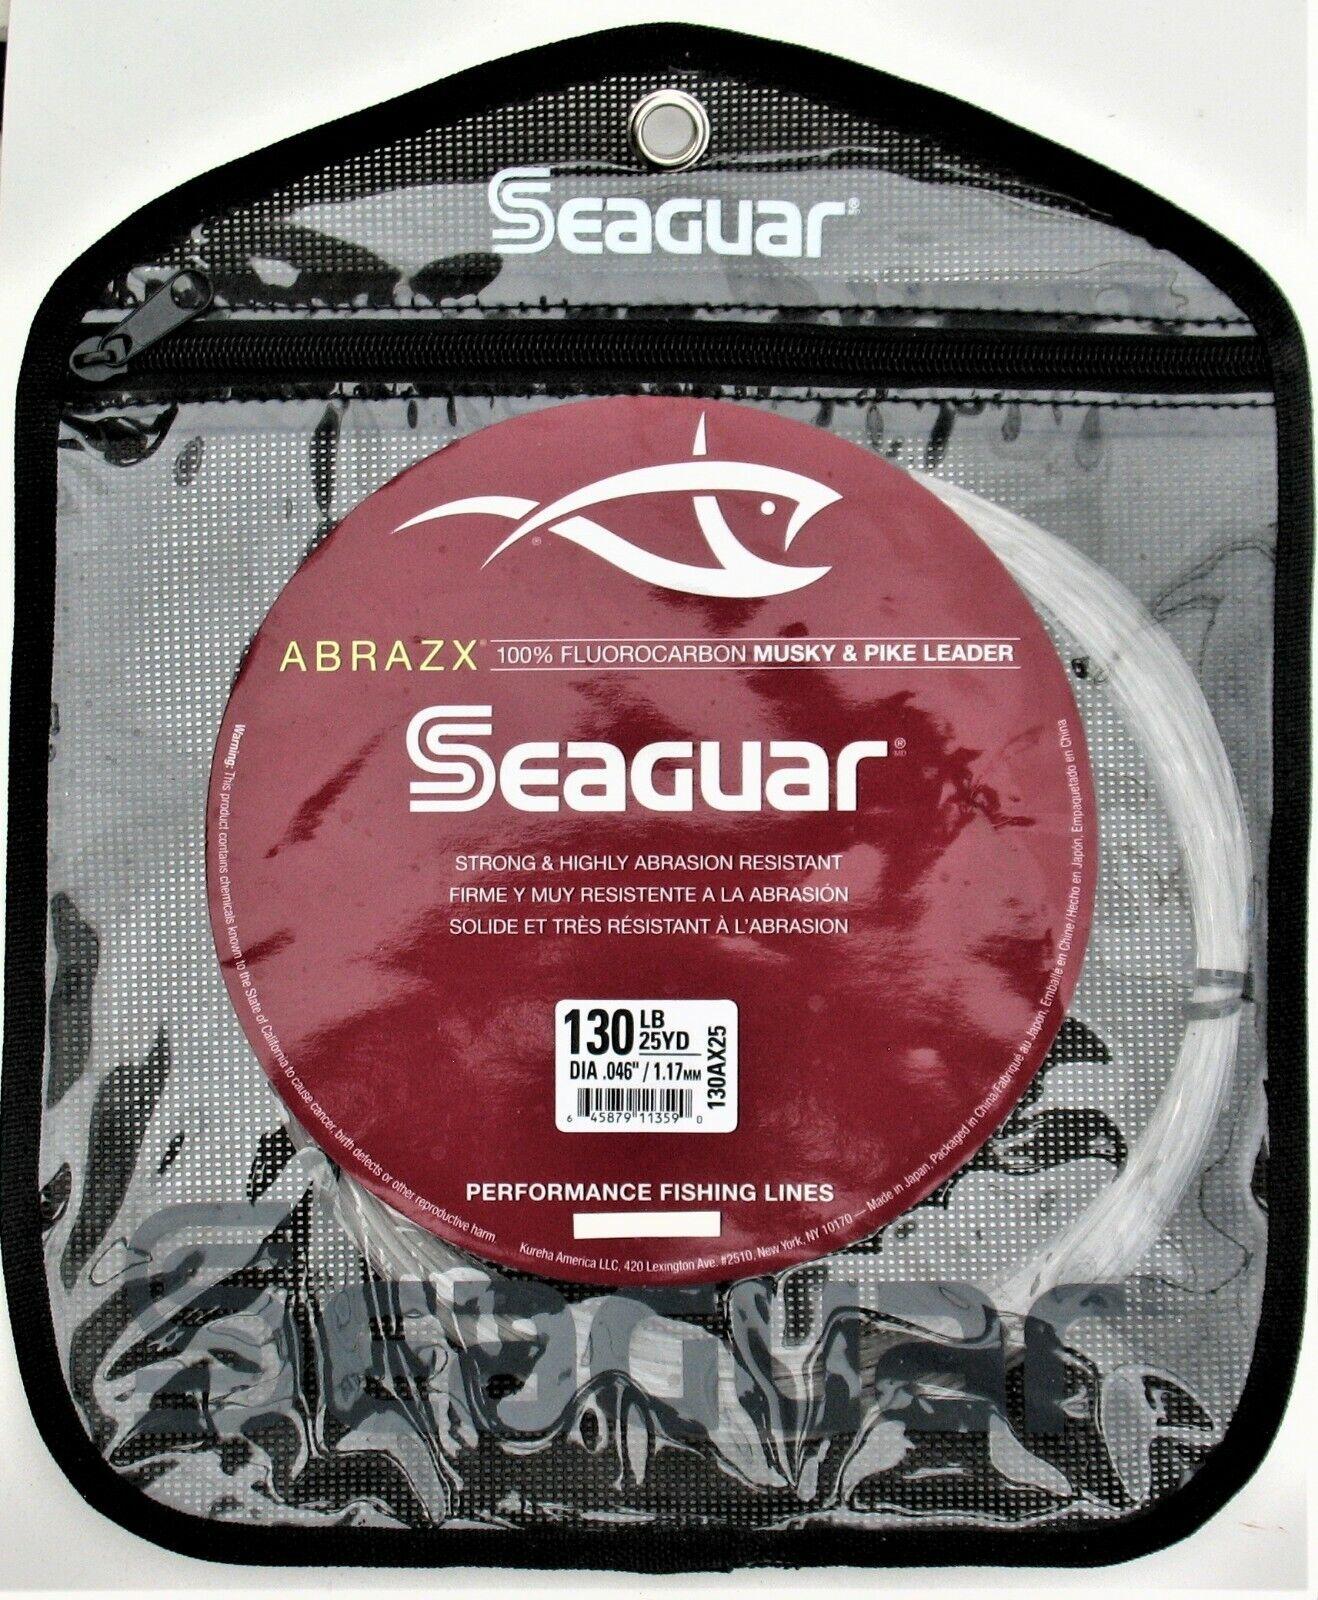 SEAGUAR ABRAZX 100% FLUoroCARBON MUSKYPIKE LEADER 130 LB TEST 25 YARDS